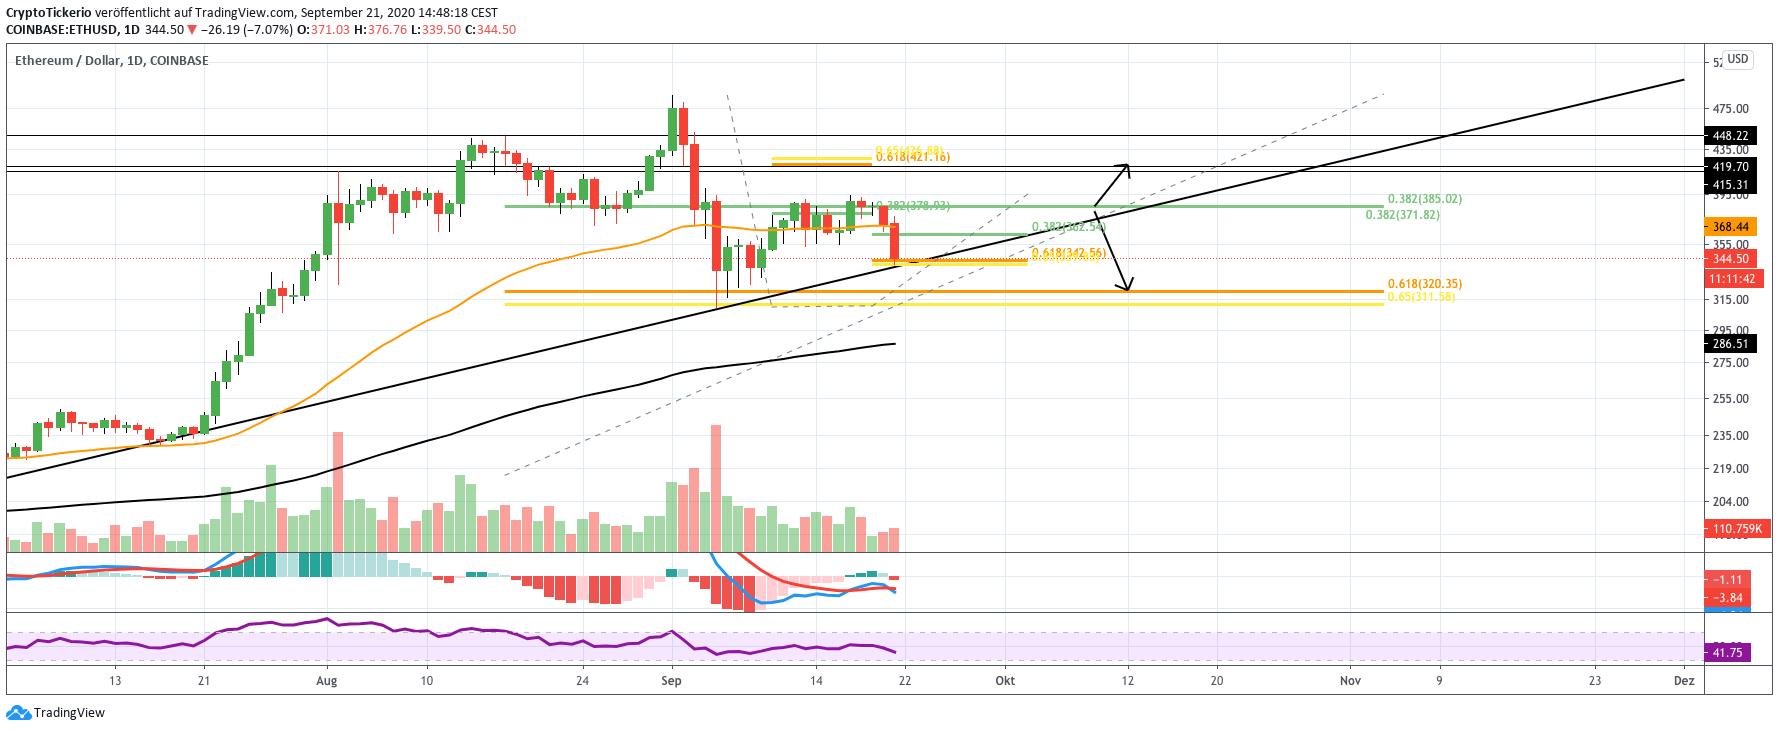 ETH/USD daily price chart analysis